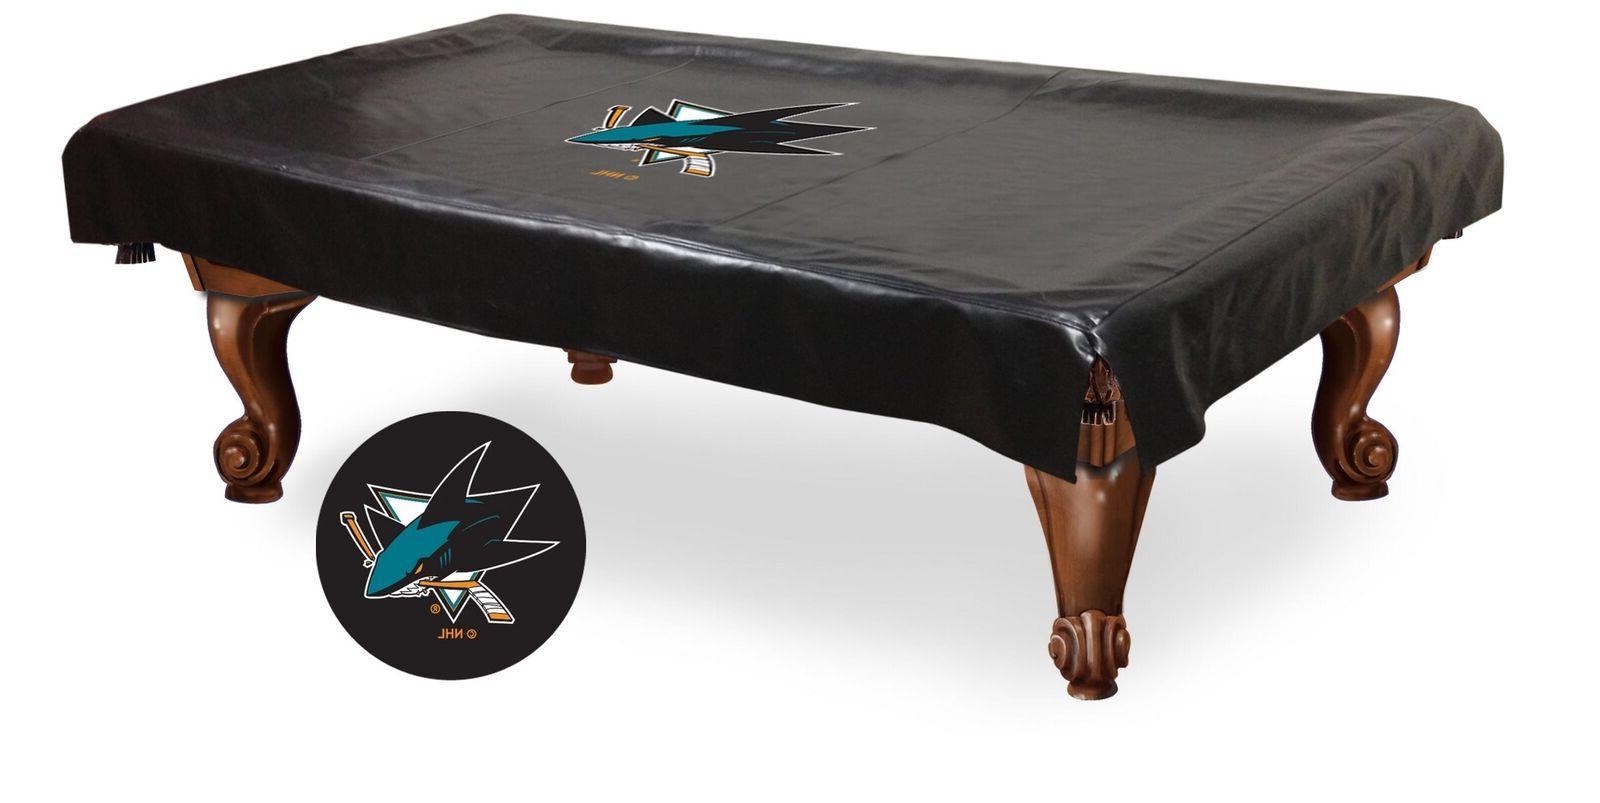 nhl san jose sharks billiard table cover